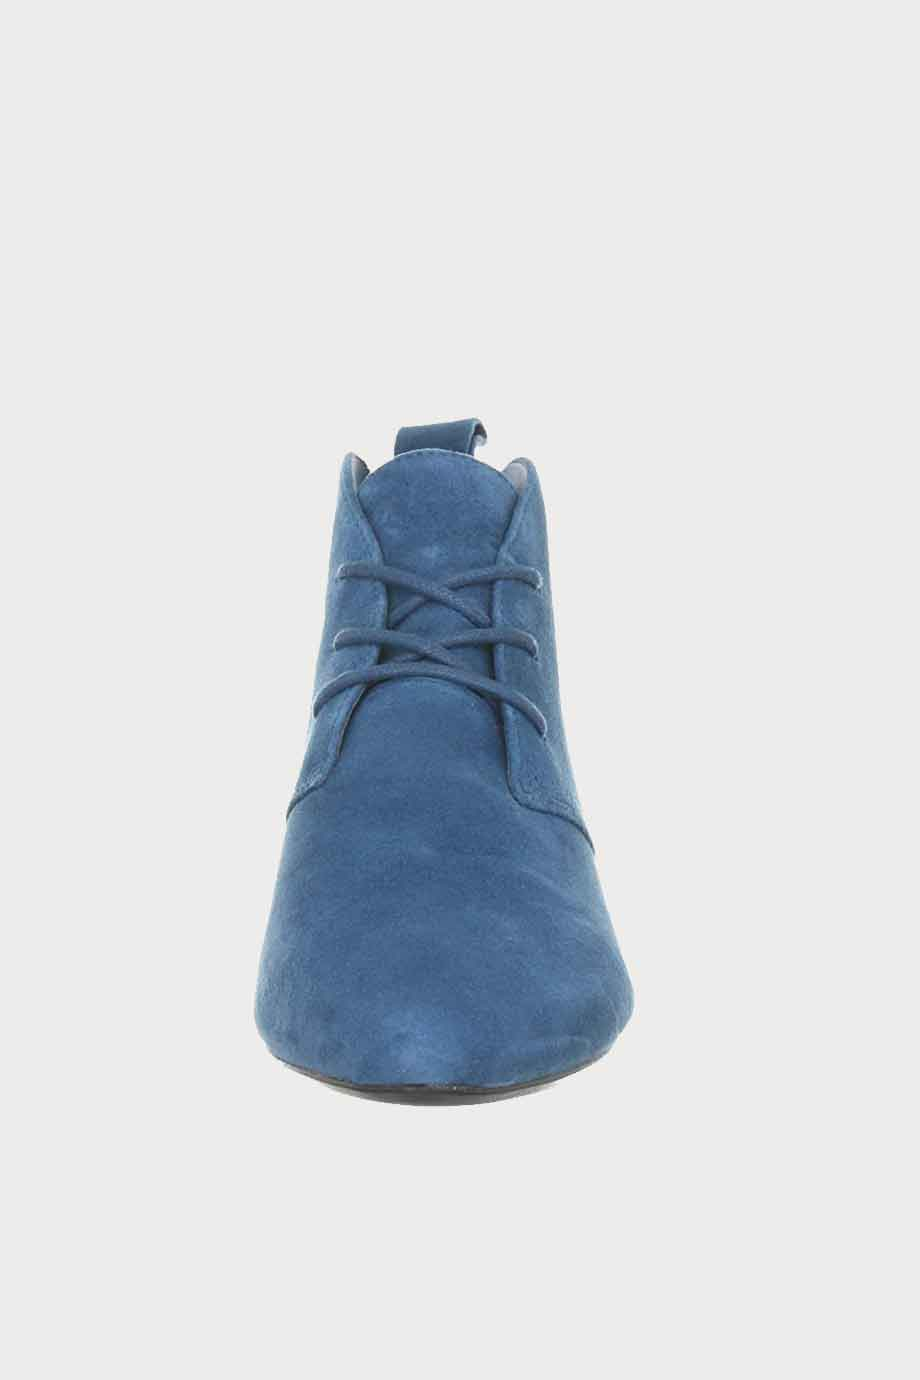 spiridoula metheniti shoes xalkida p Lulworth Beach Navy Clarks2